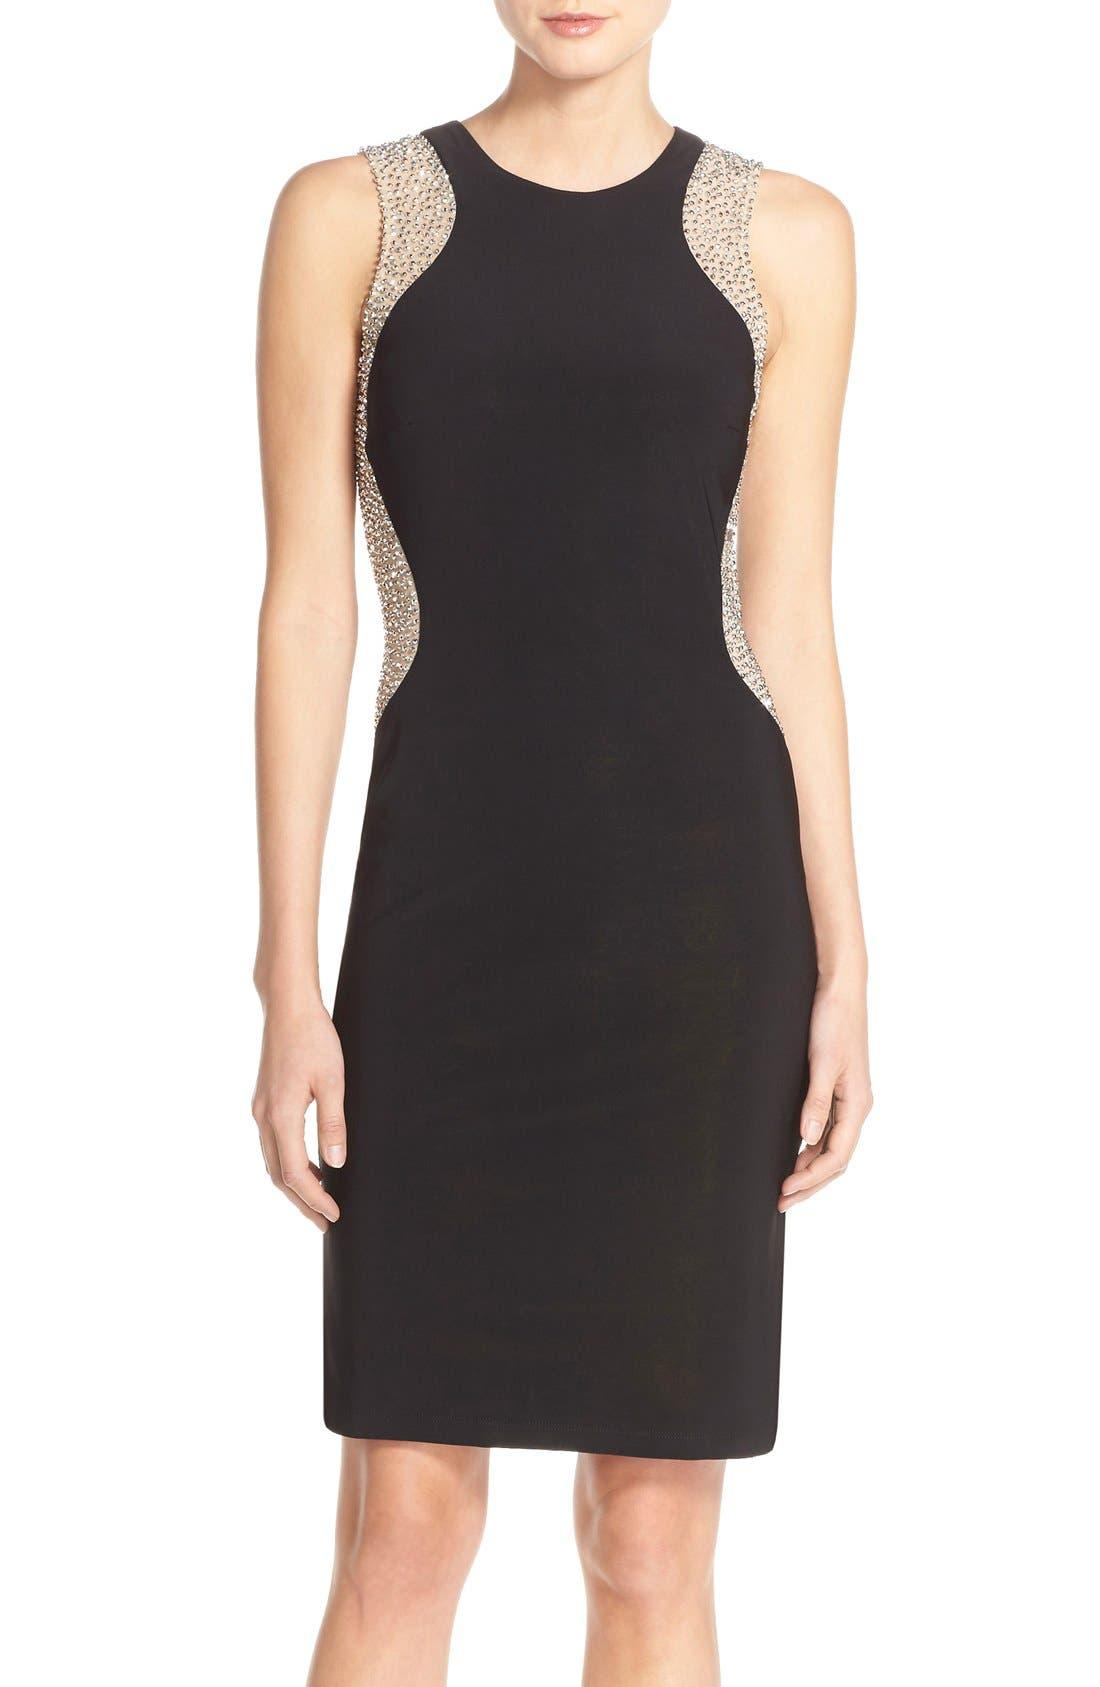 Alternate Image 1 Selected - Xscape Beaded Mesh & Jersey Sheath Dress